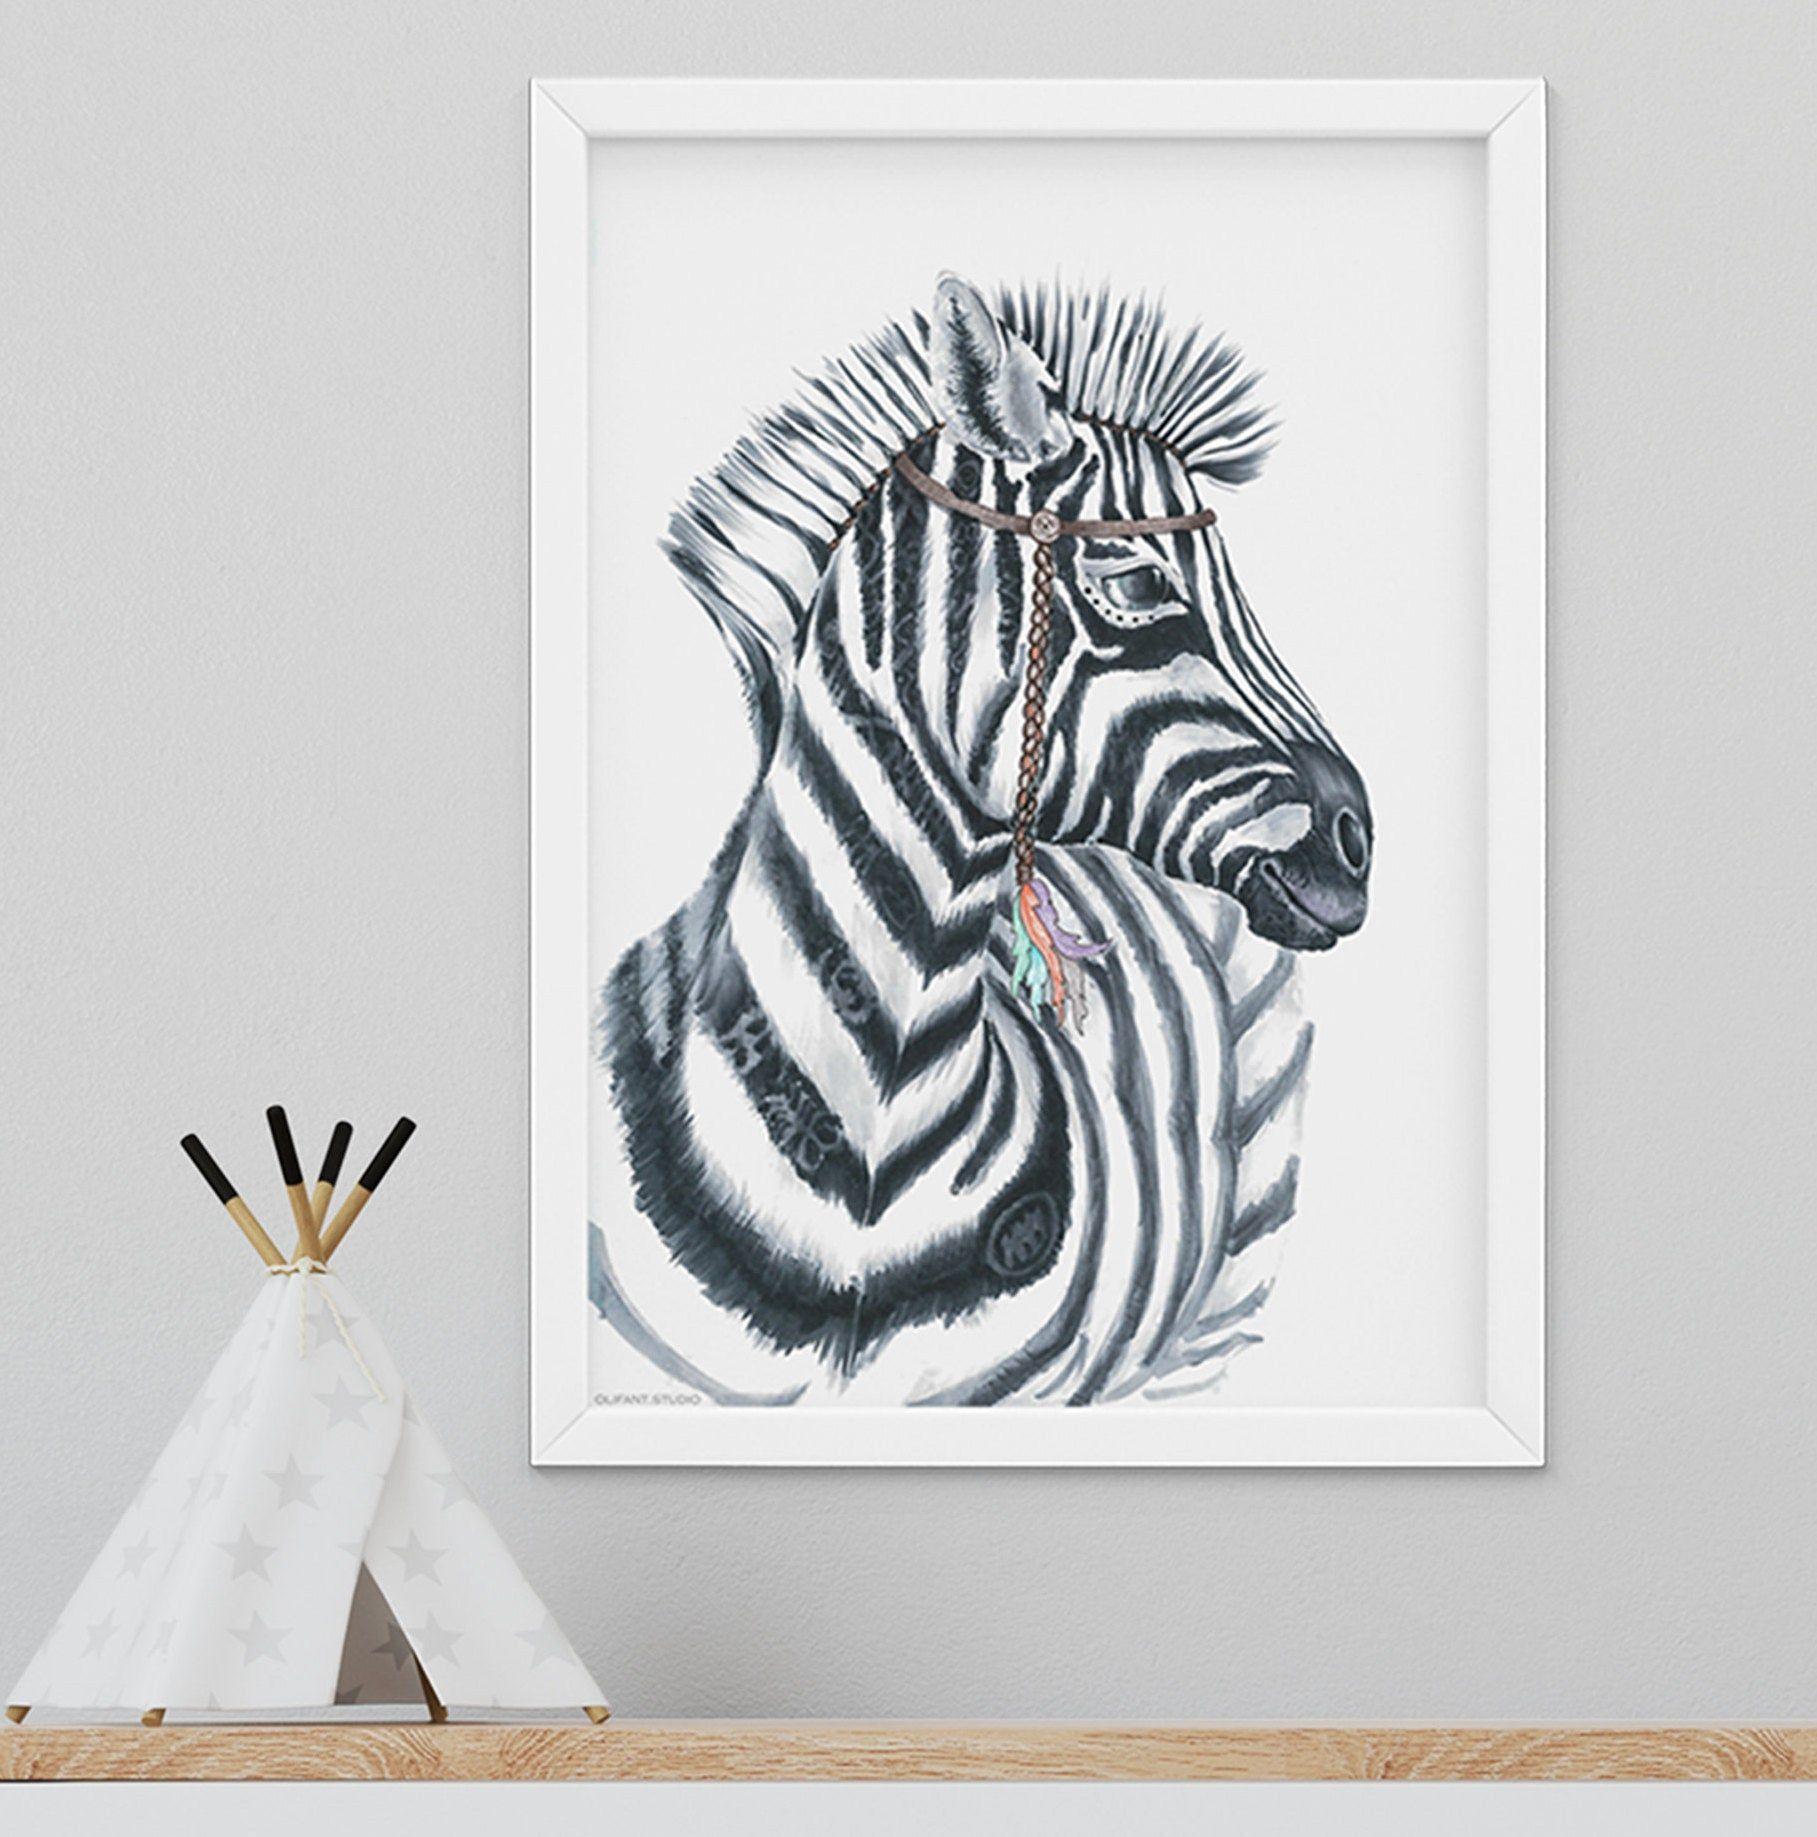 Zebra Print Safari Wall Decor Africa Animals Poster Zebra Etsy In 2020 Zebra Wall Art Animal Posters Safari Nursery Prints